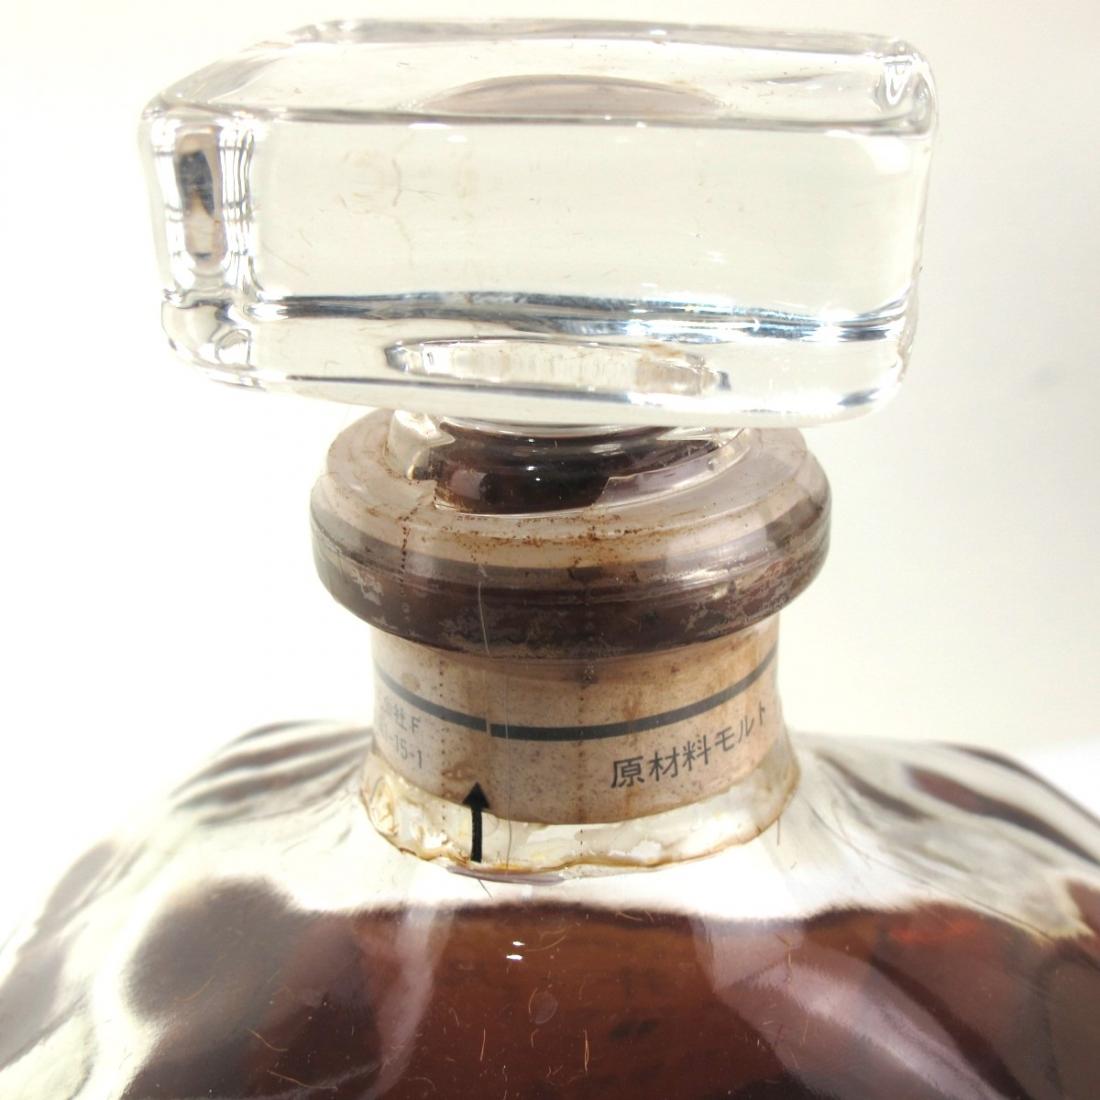 Karuizawa 10 Year Old 100% Malt Whisky 72cl / Ocean